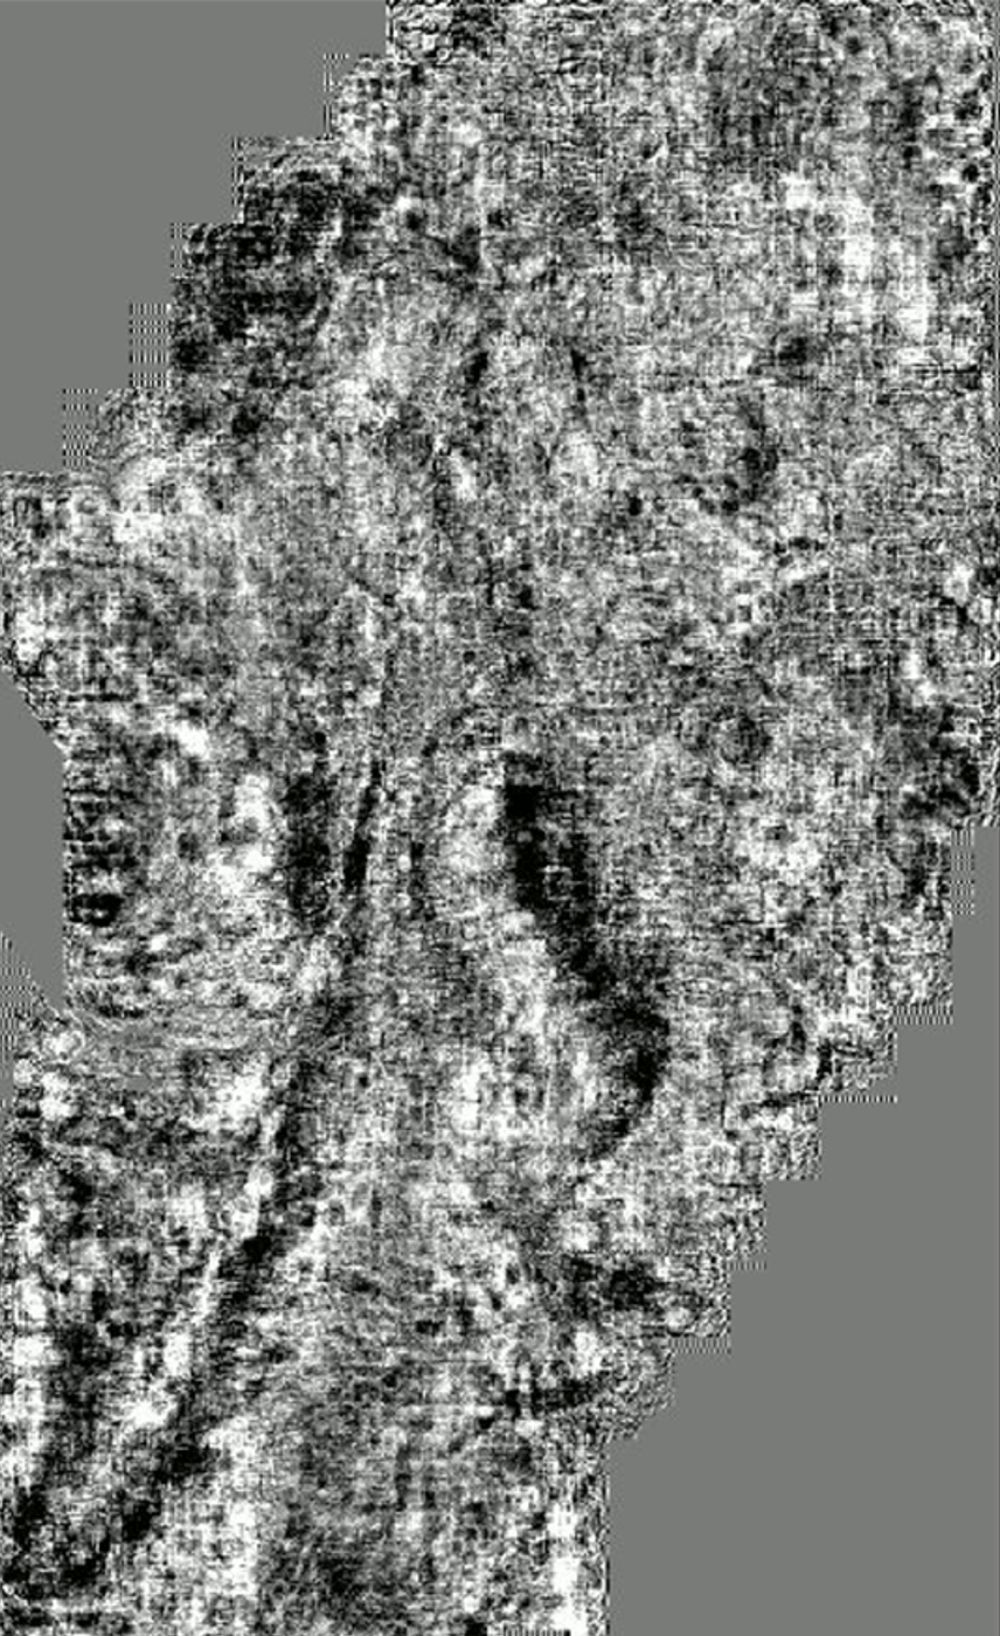 reprocessing_ts_frame_0001